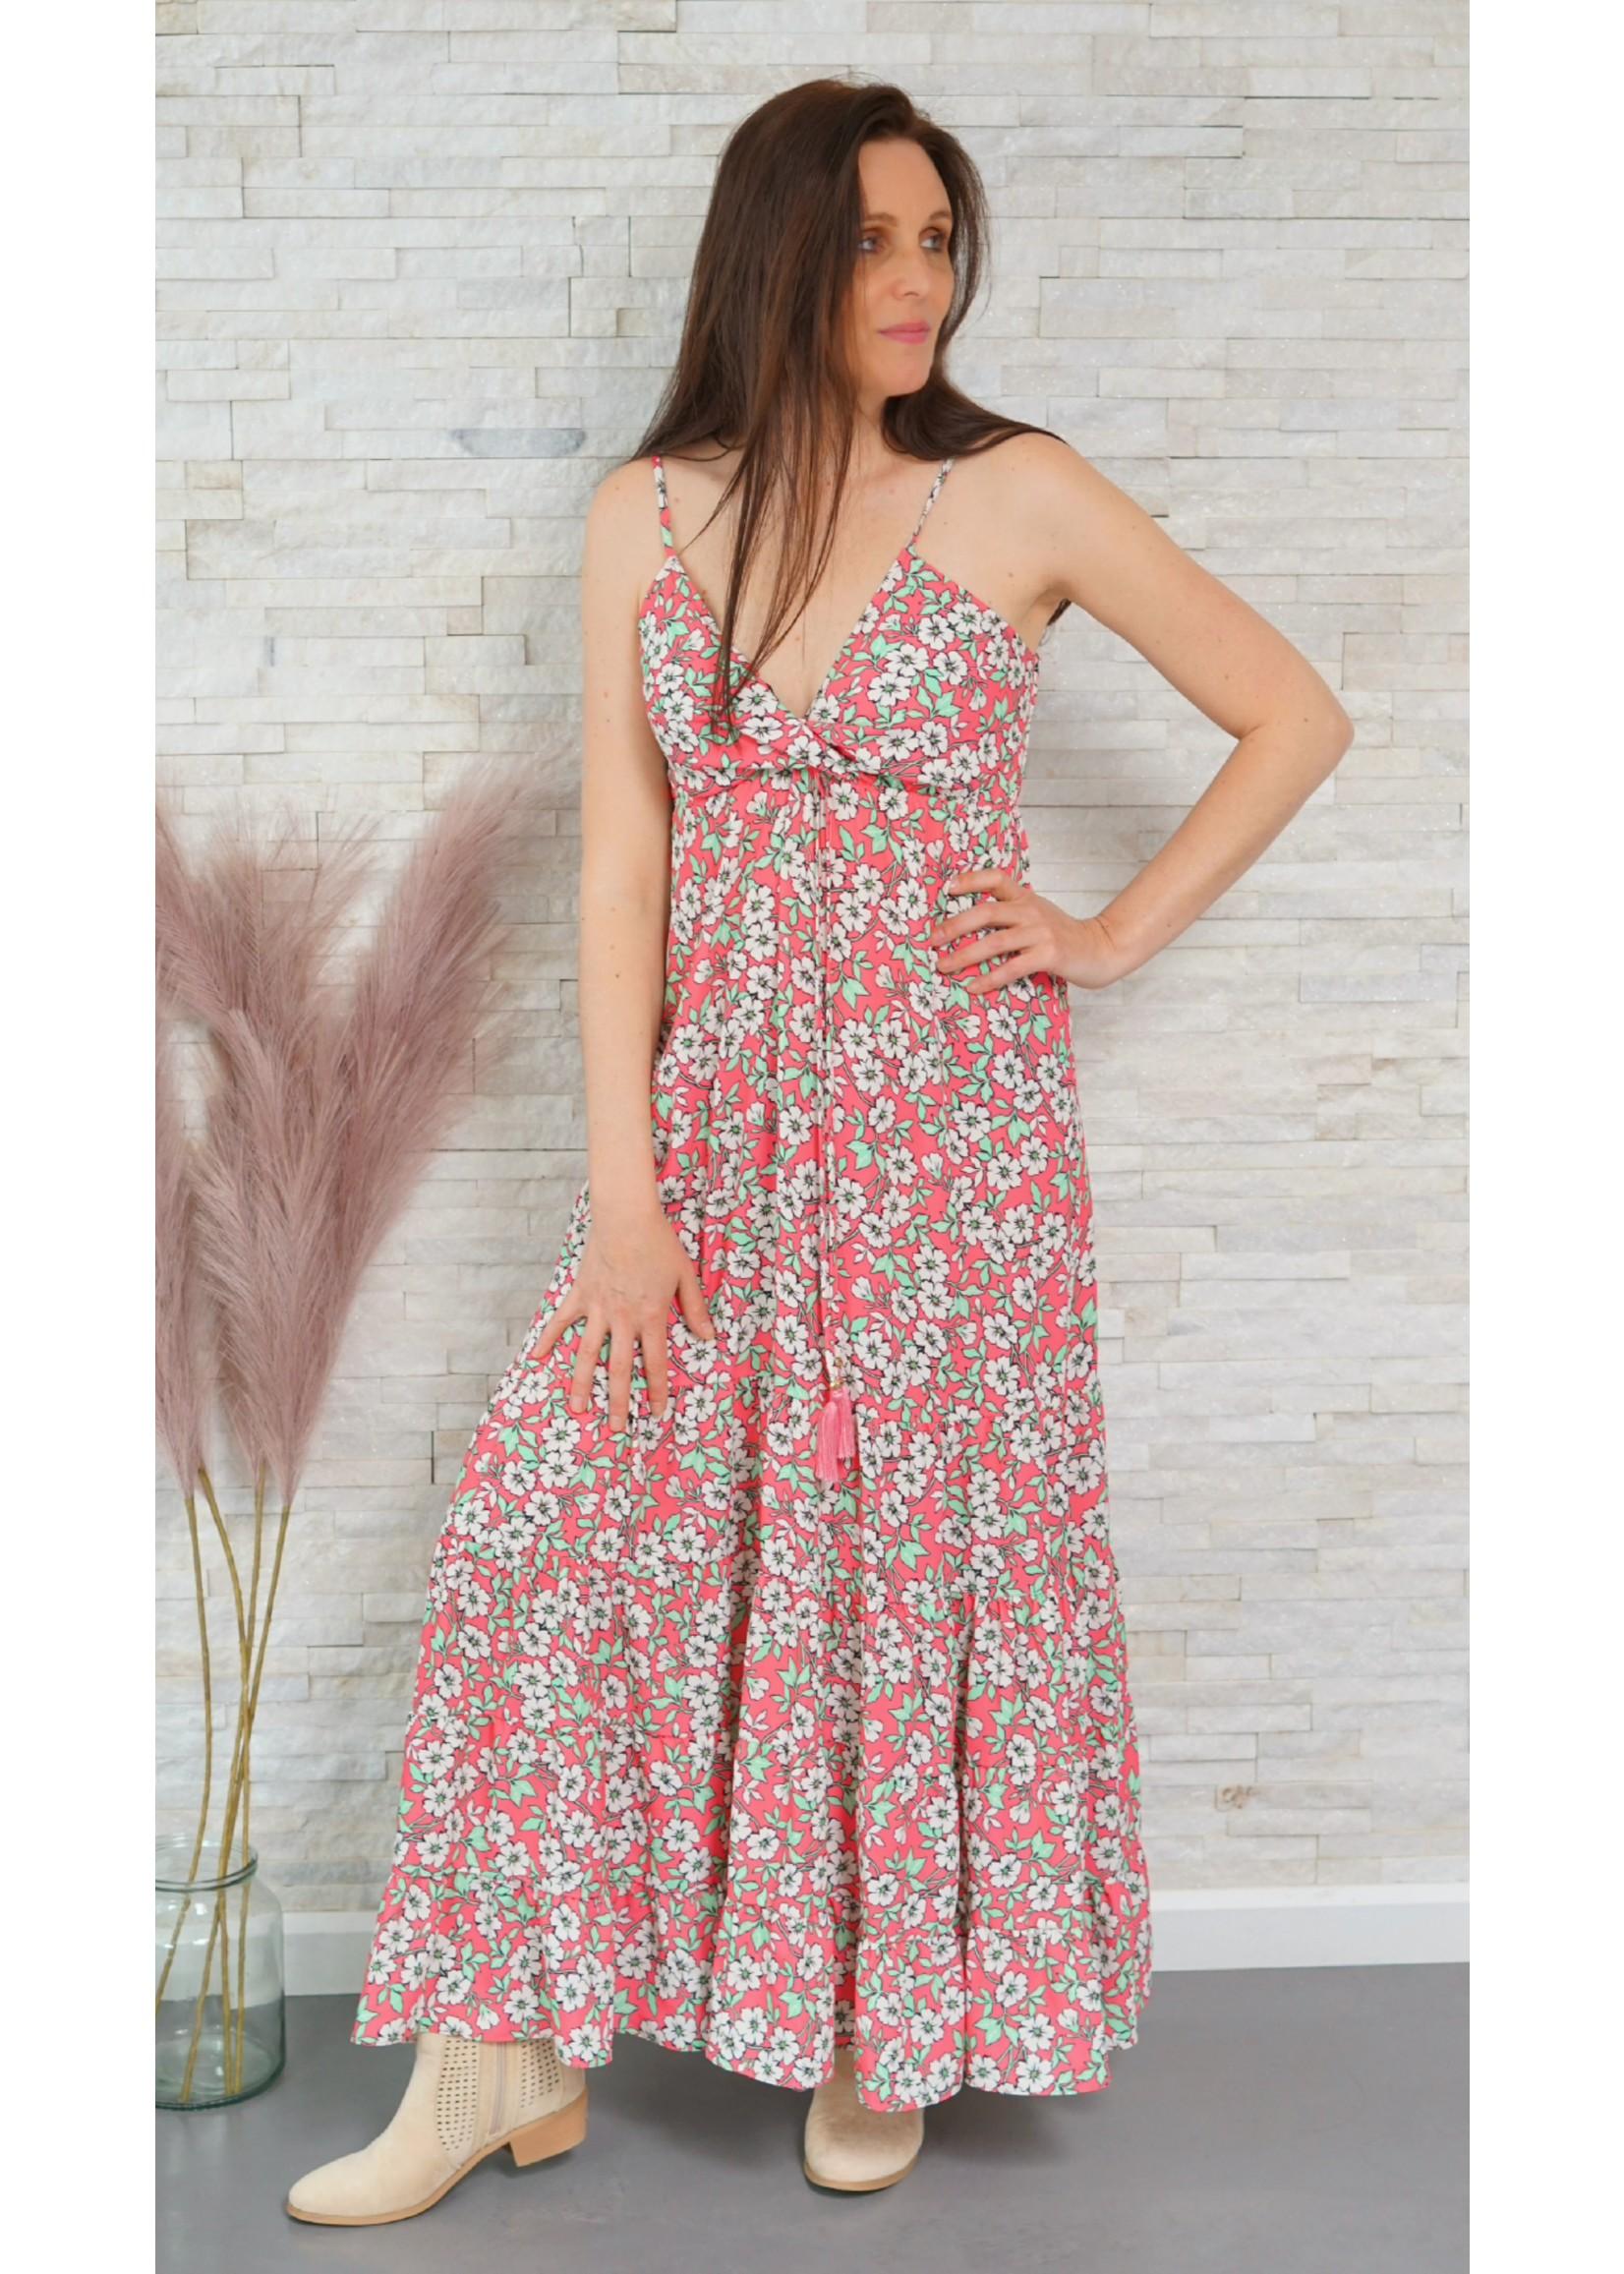 yentlK.byyentl Yentlk summer ready dress